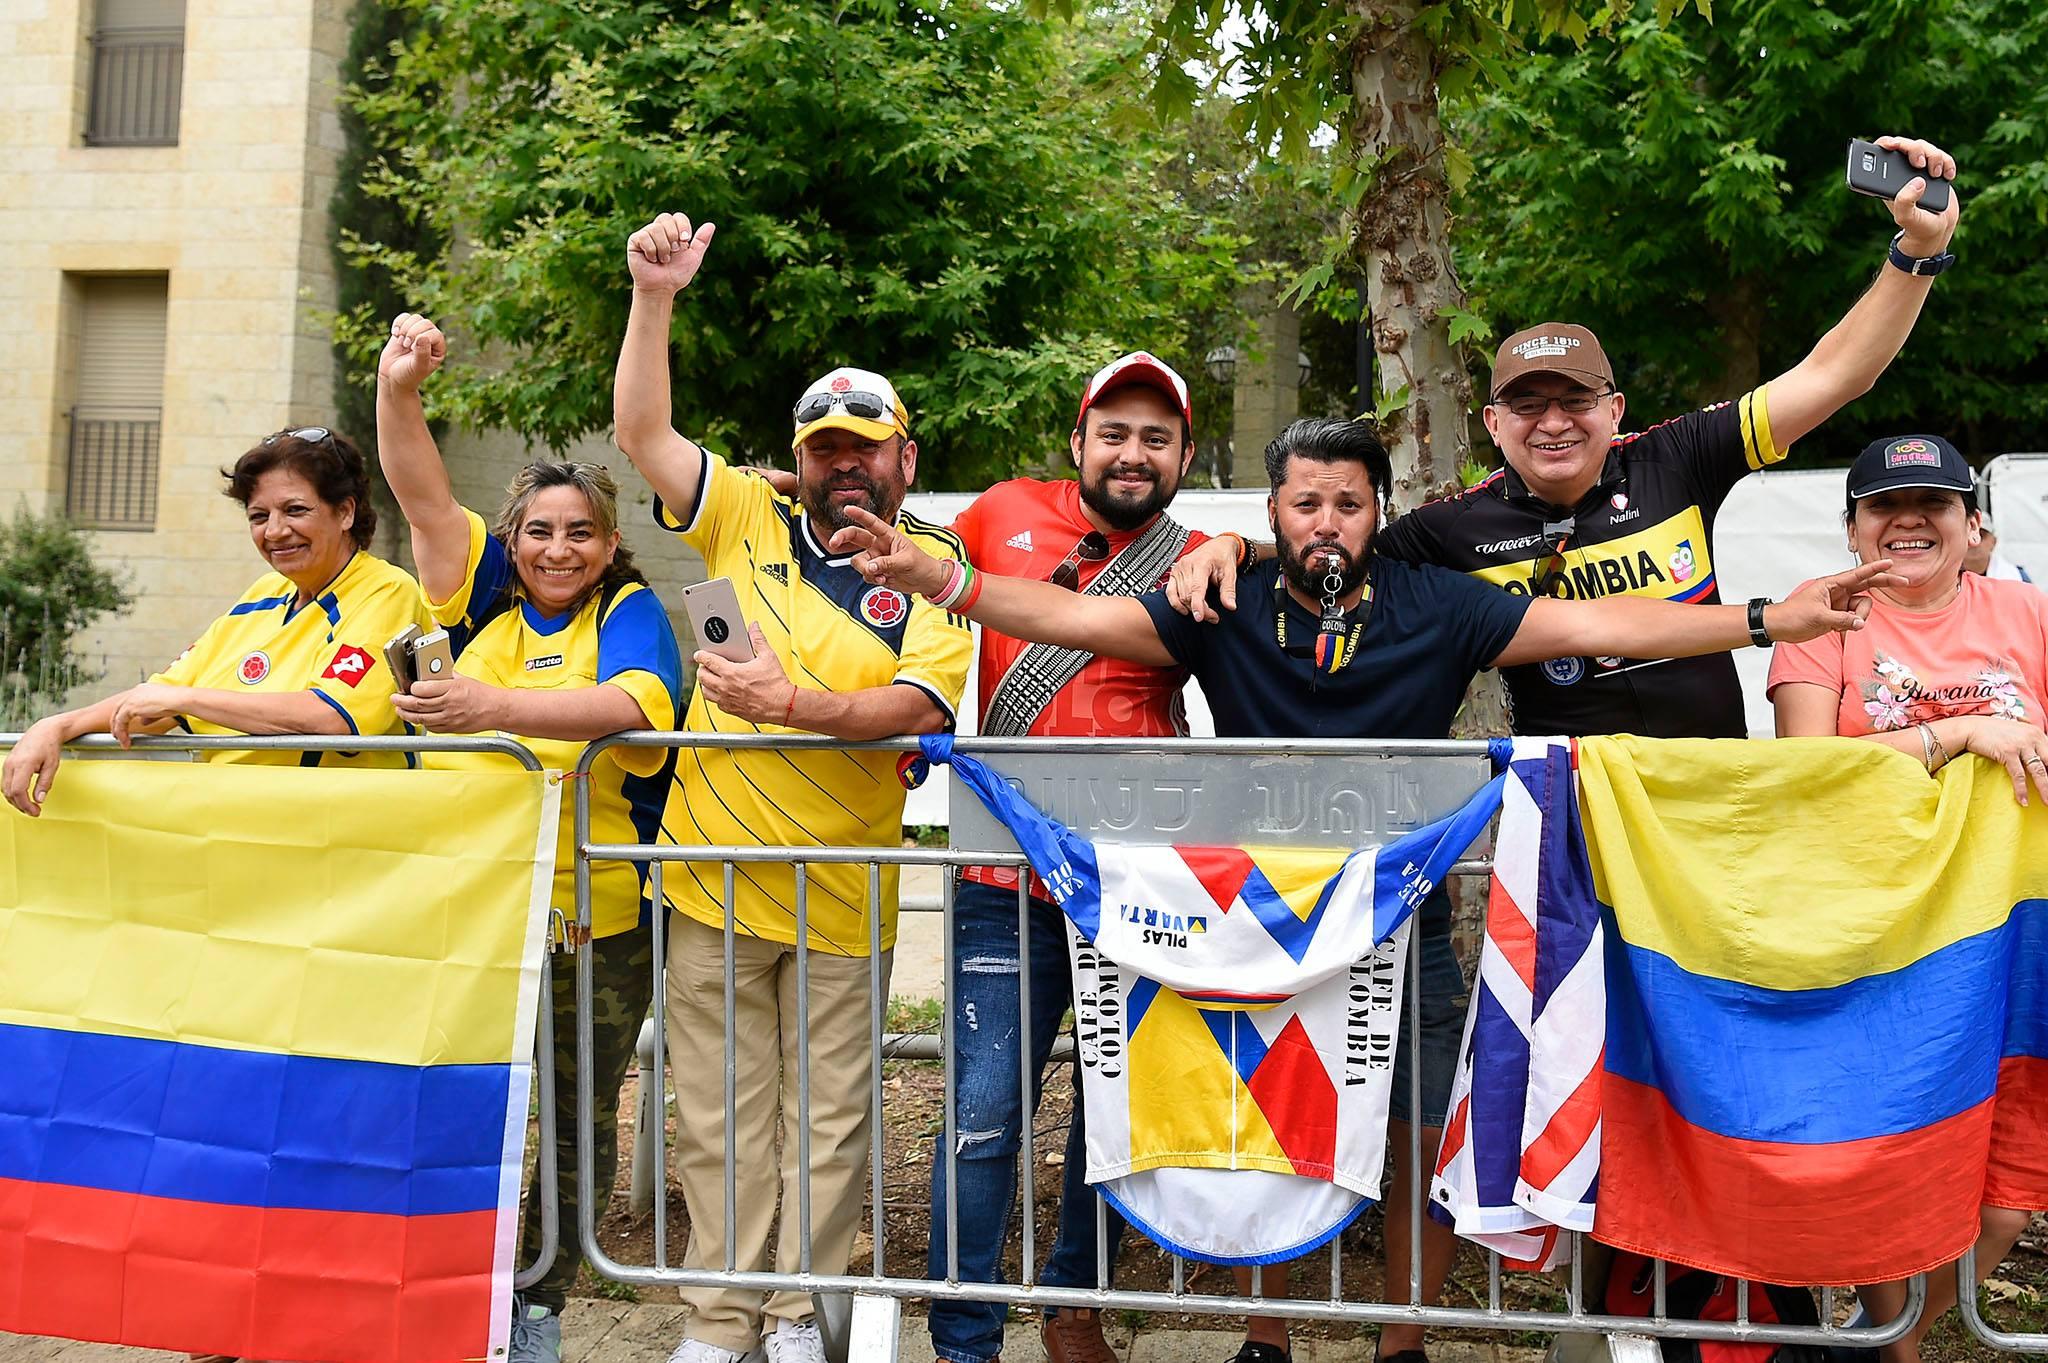 Giro ciclismo colombiano JoanSeguidor